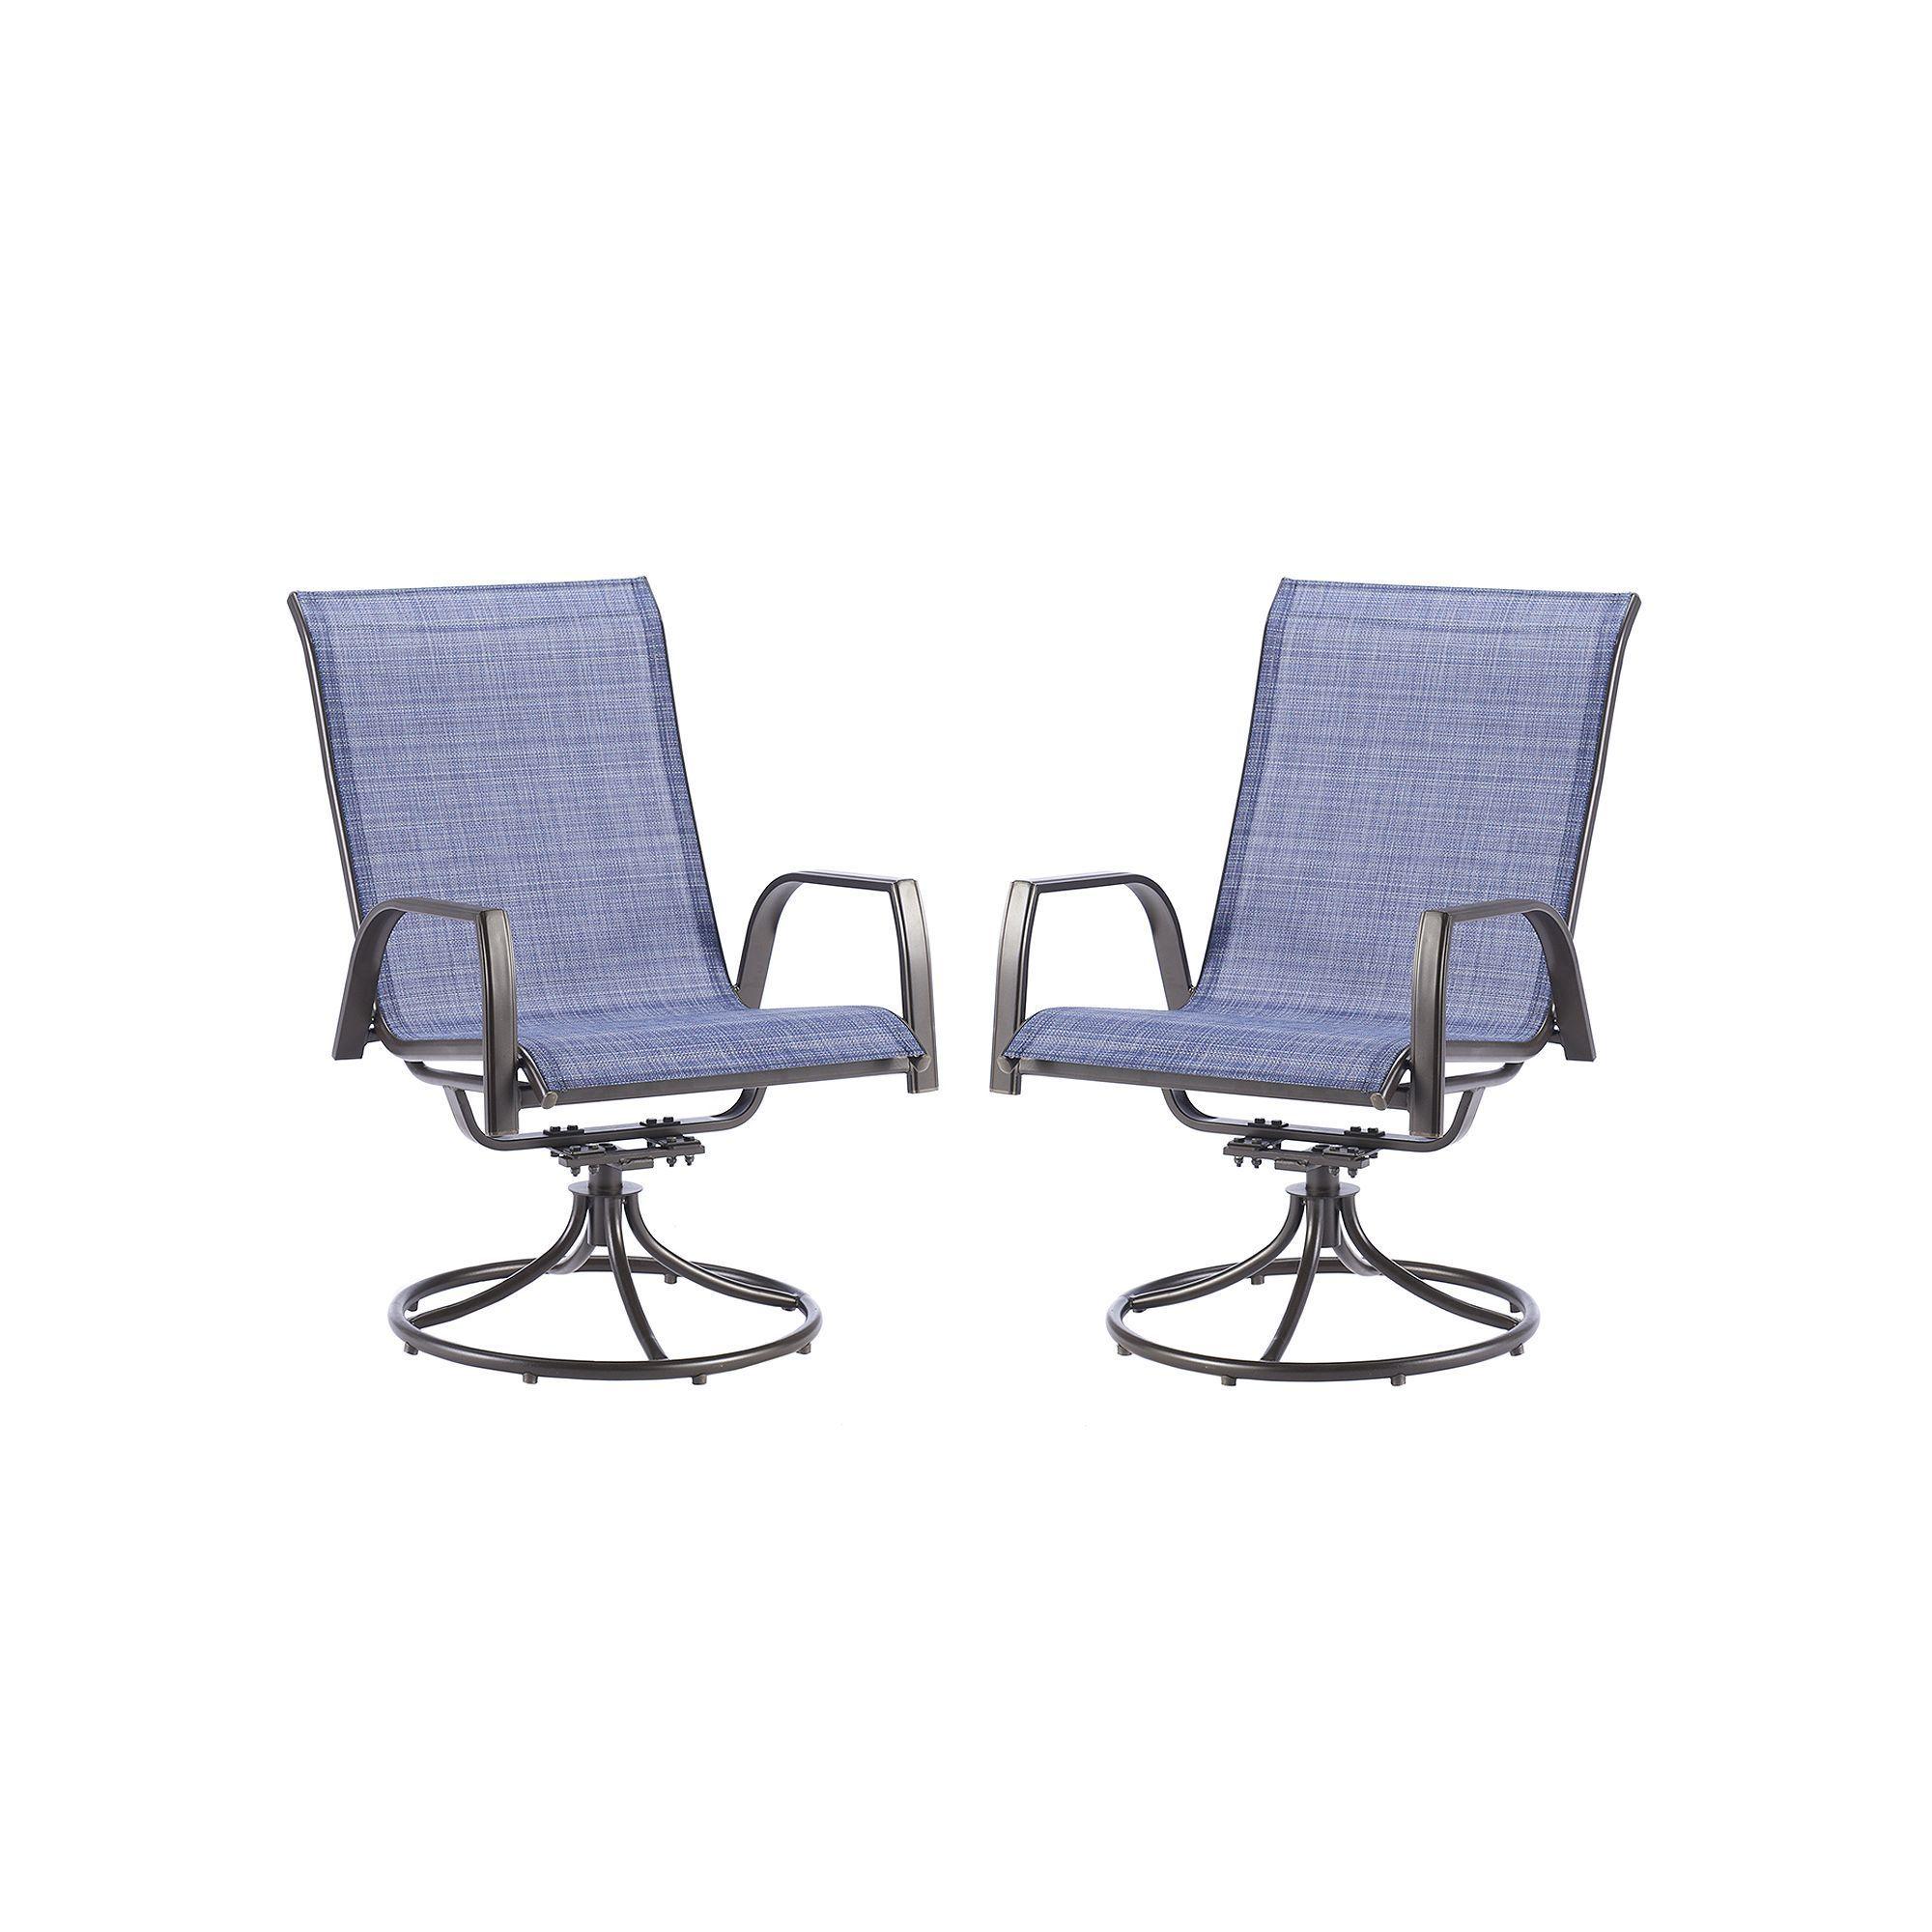 outdoor sonoma goods for life u201e coronado swivel sling patio chair 2 rh pinterest ca Sling Swivel Patio Chairs Parts Sling Swivel Patio Chairs Parts